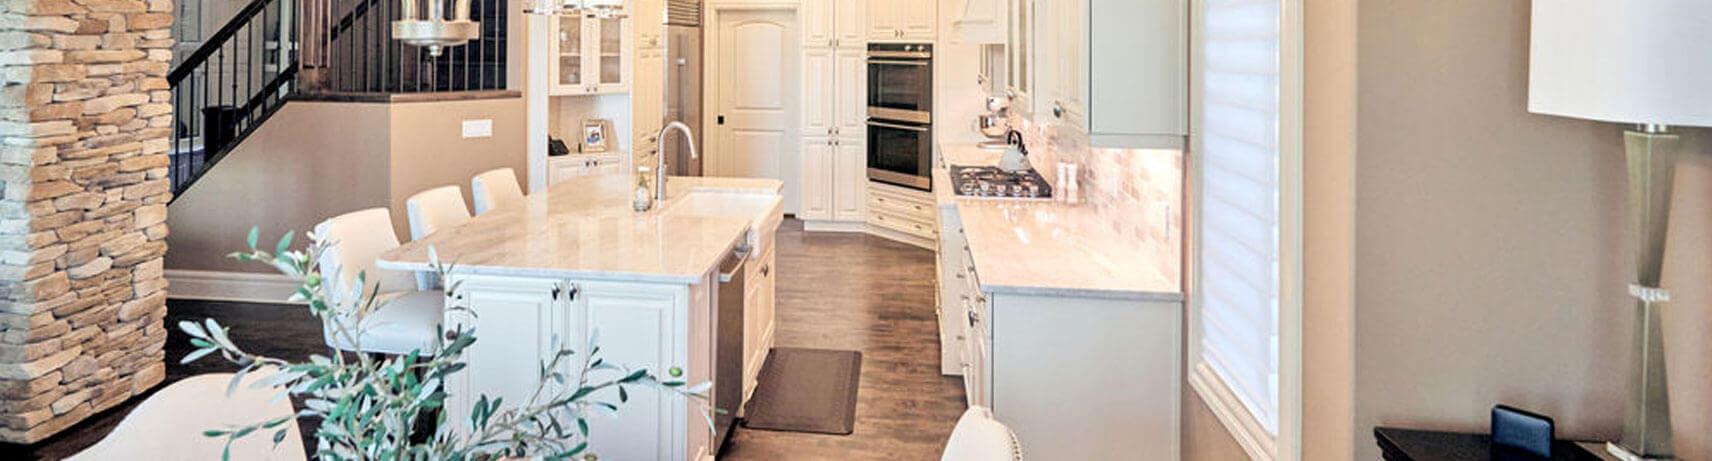 Okotoks Home Renovations, Kitchen Remodeling and Bathroom Remodeling